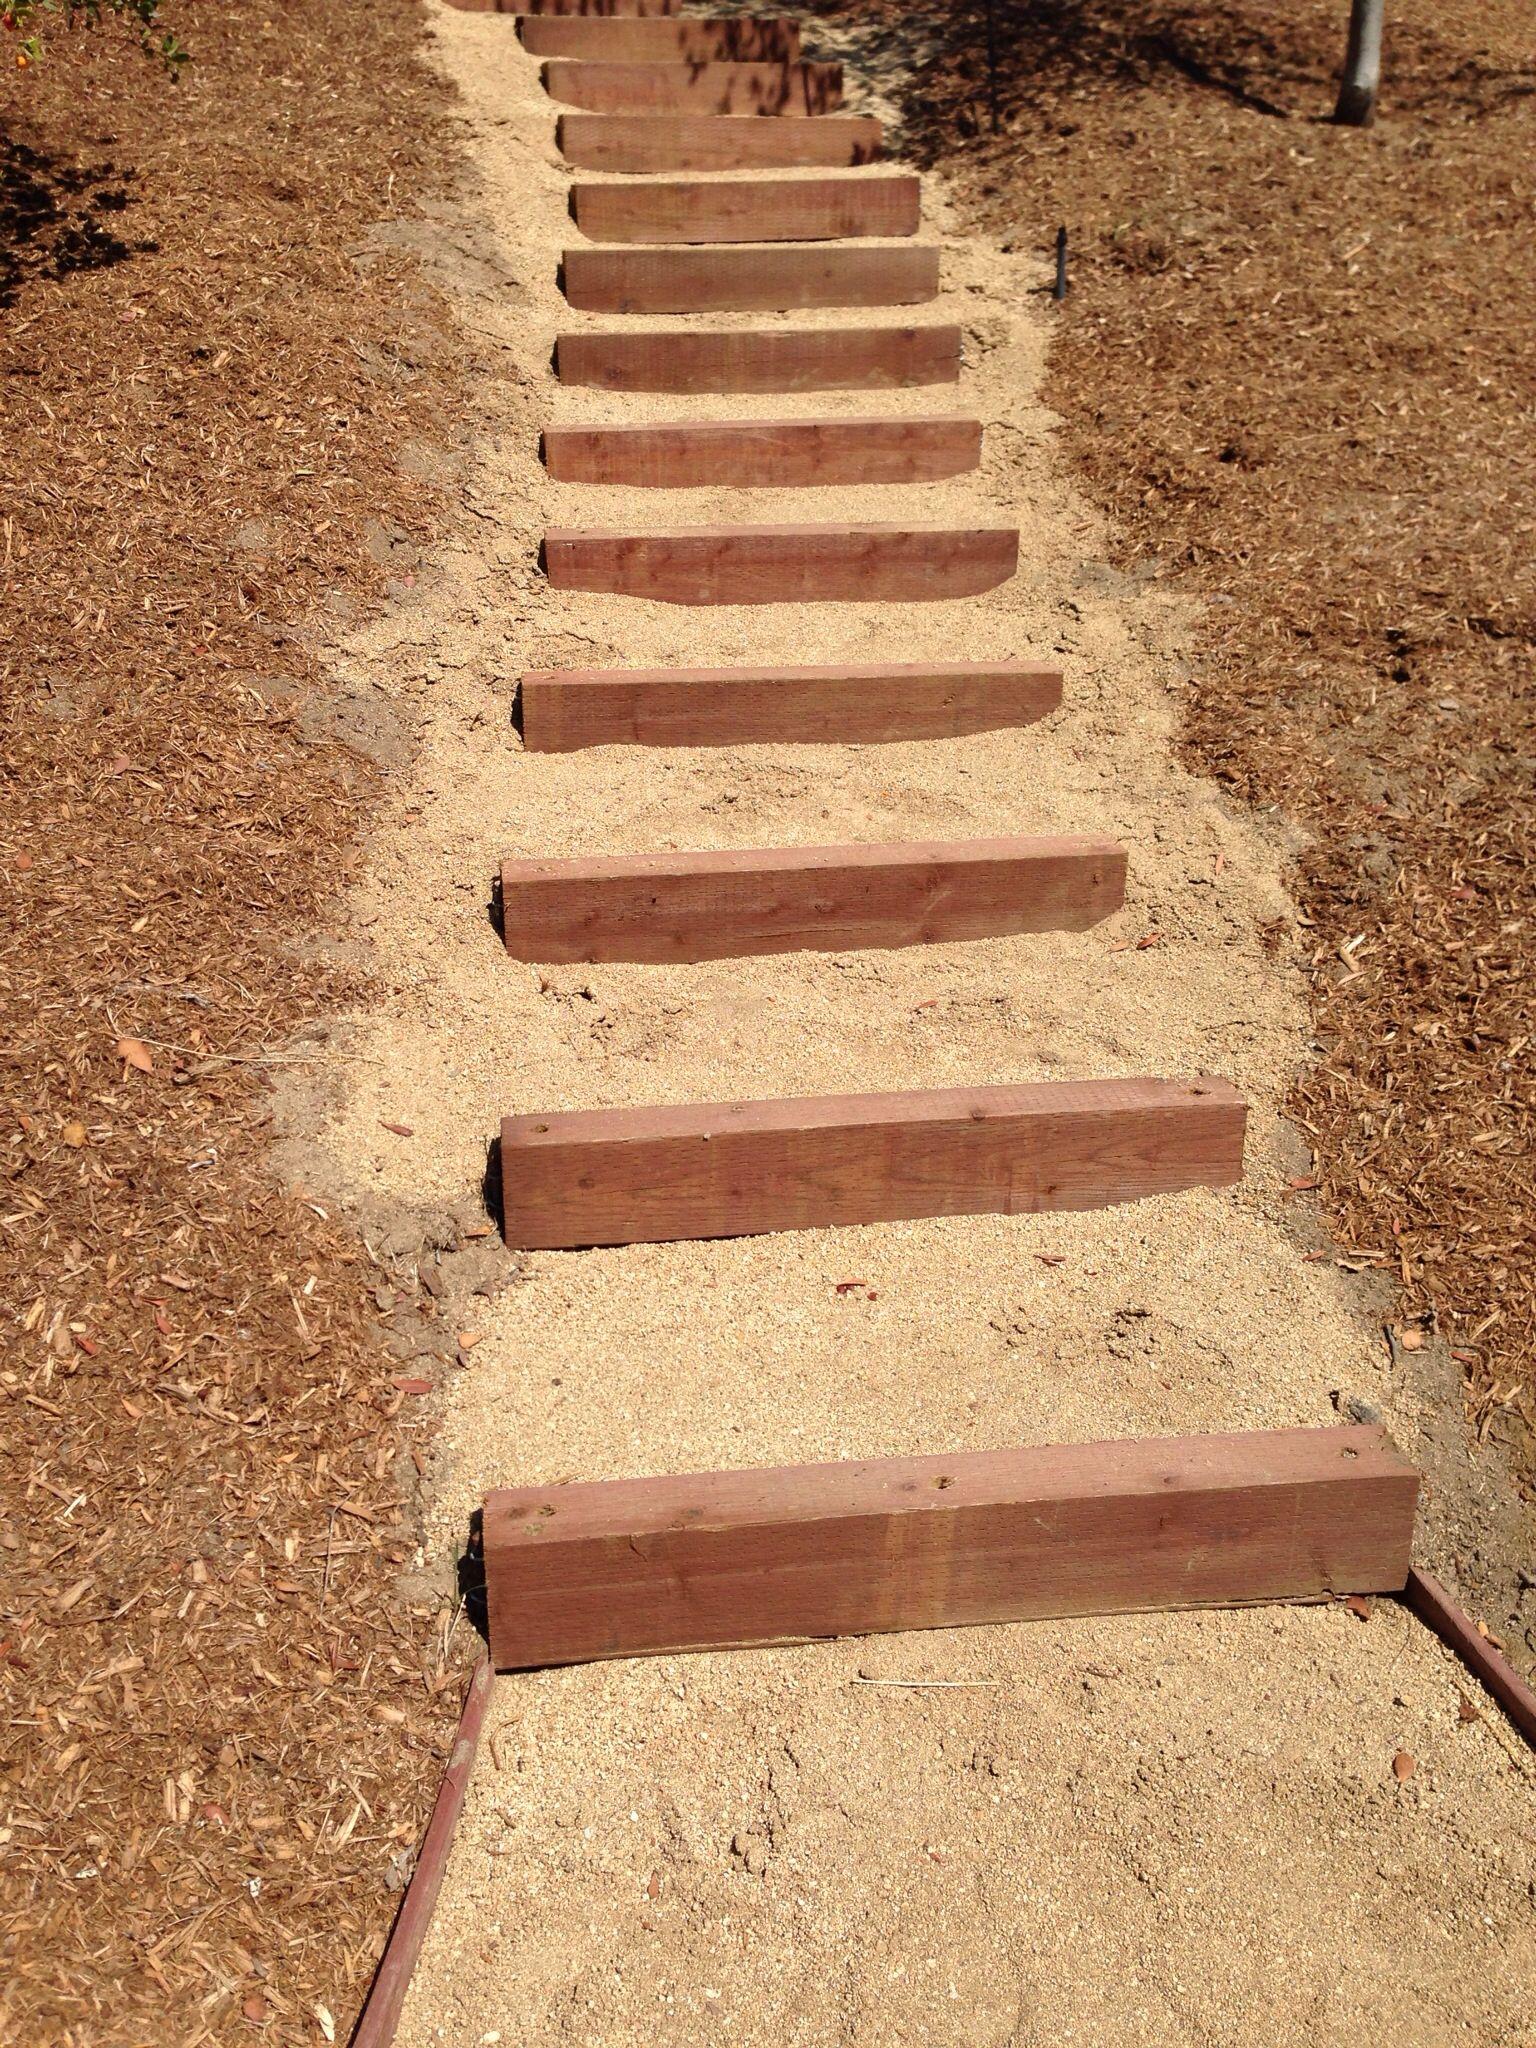 Decomposed Granite & Landscape timbers | Backyard patio | Pinterest ...